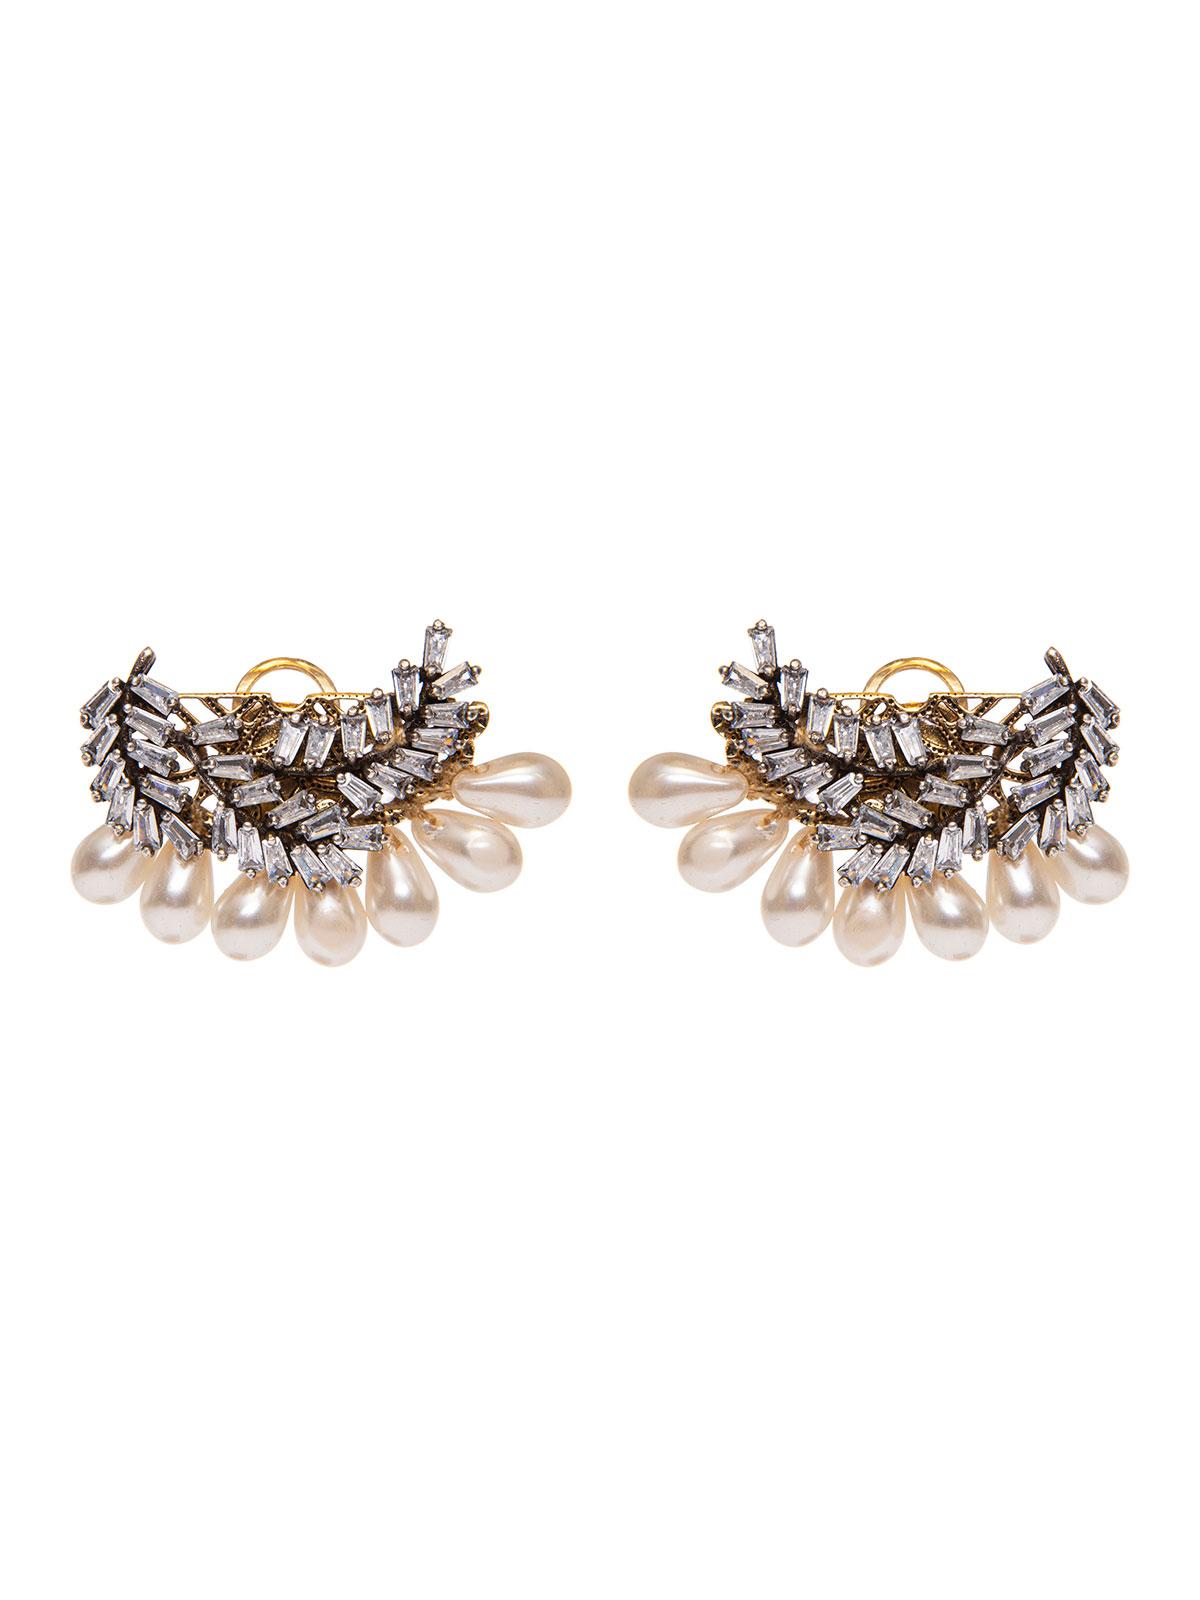 Crystal leaves earrings with pearl drops